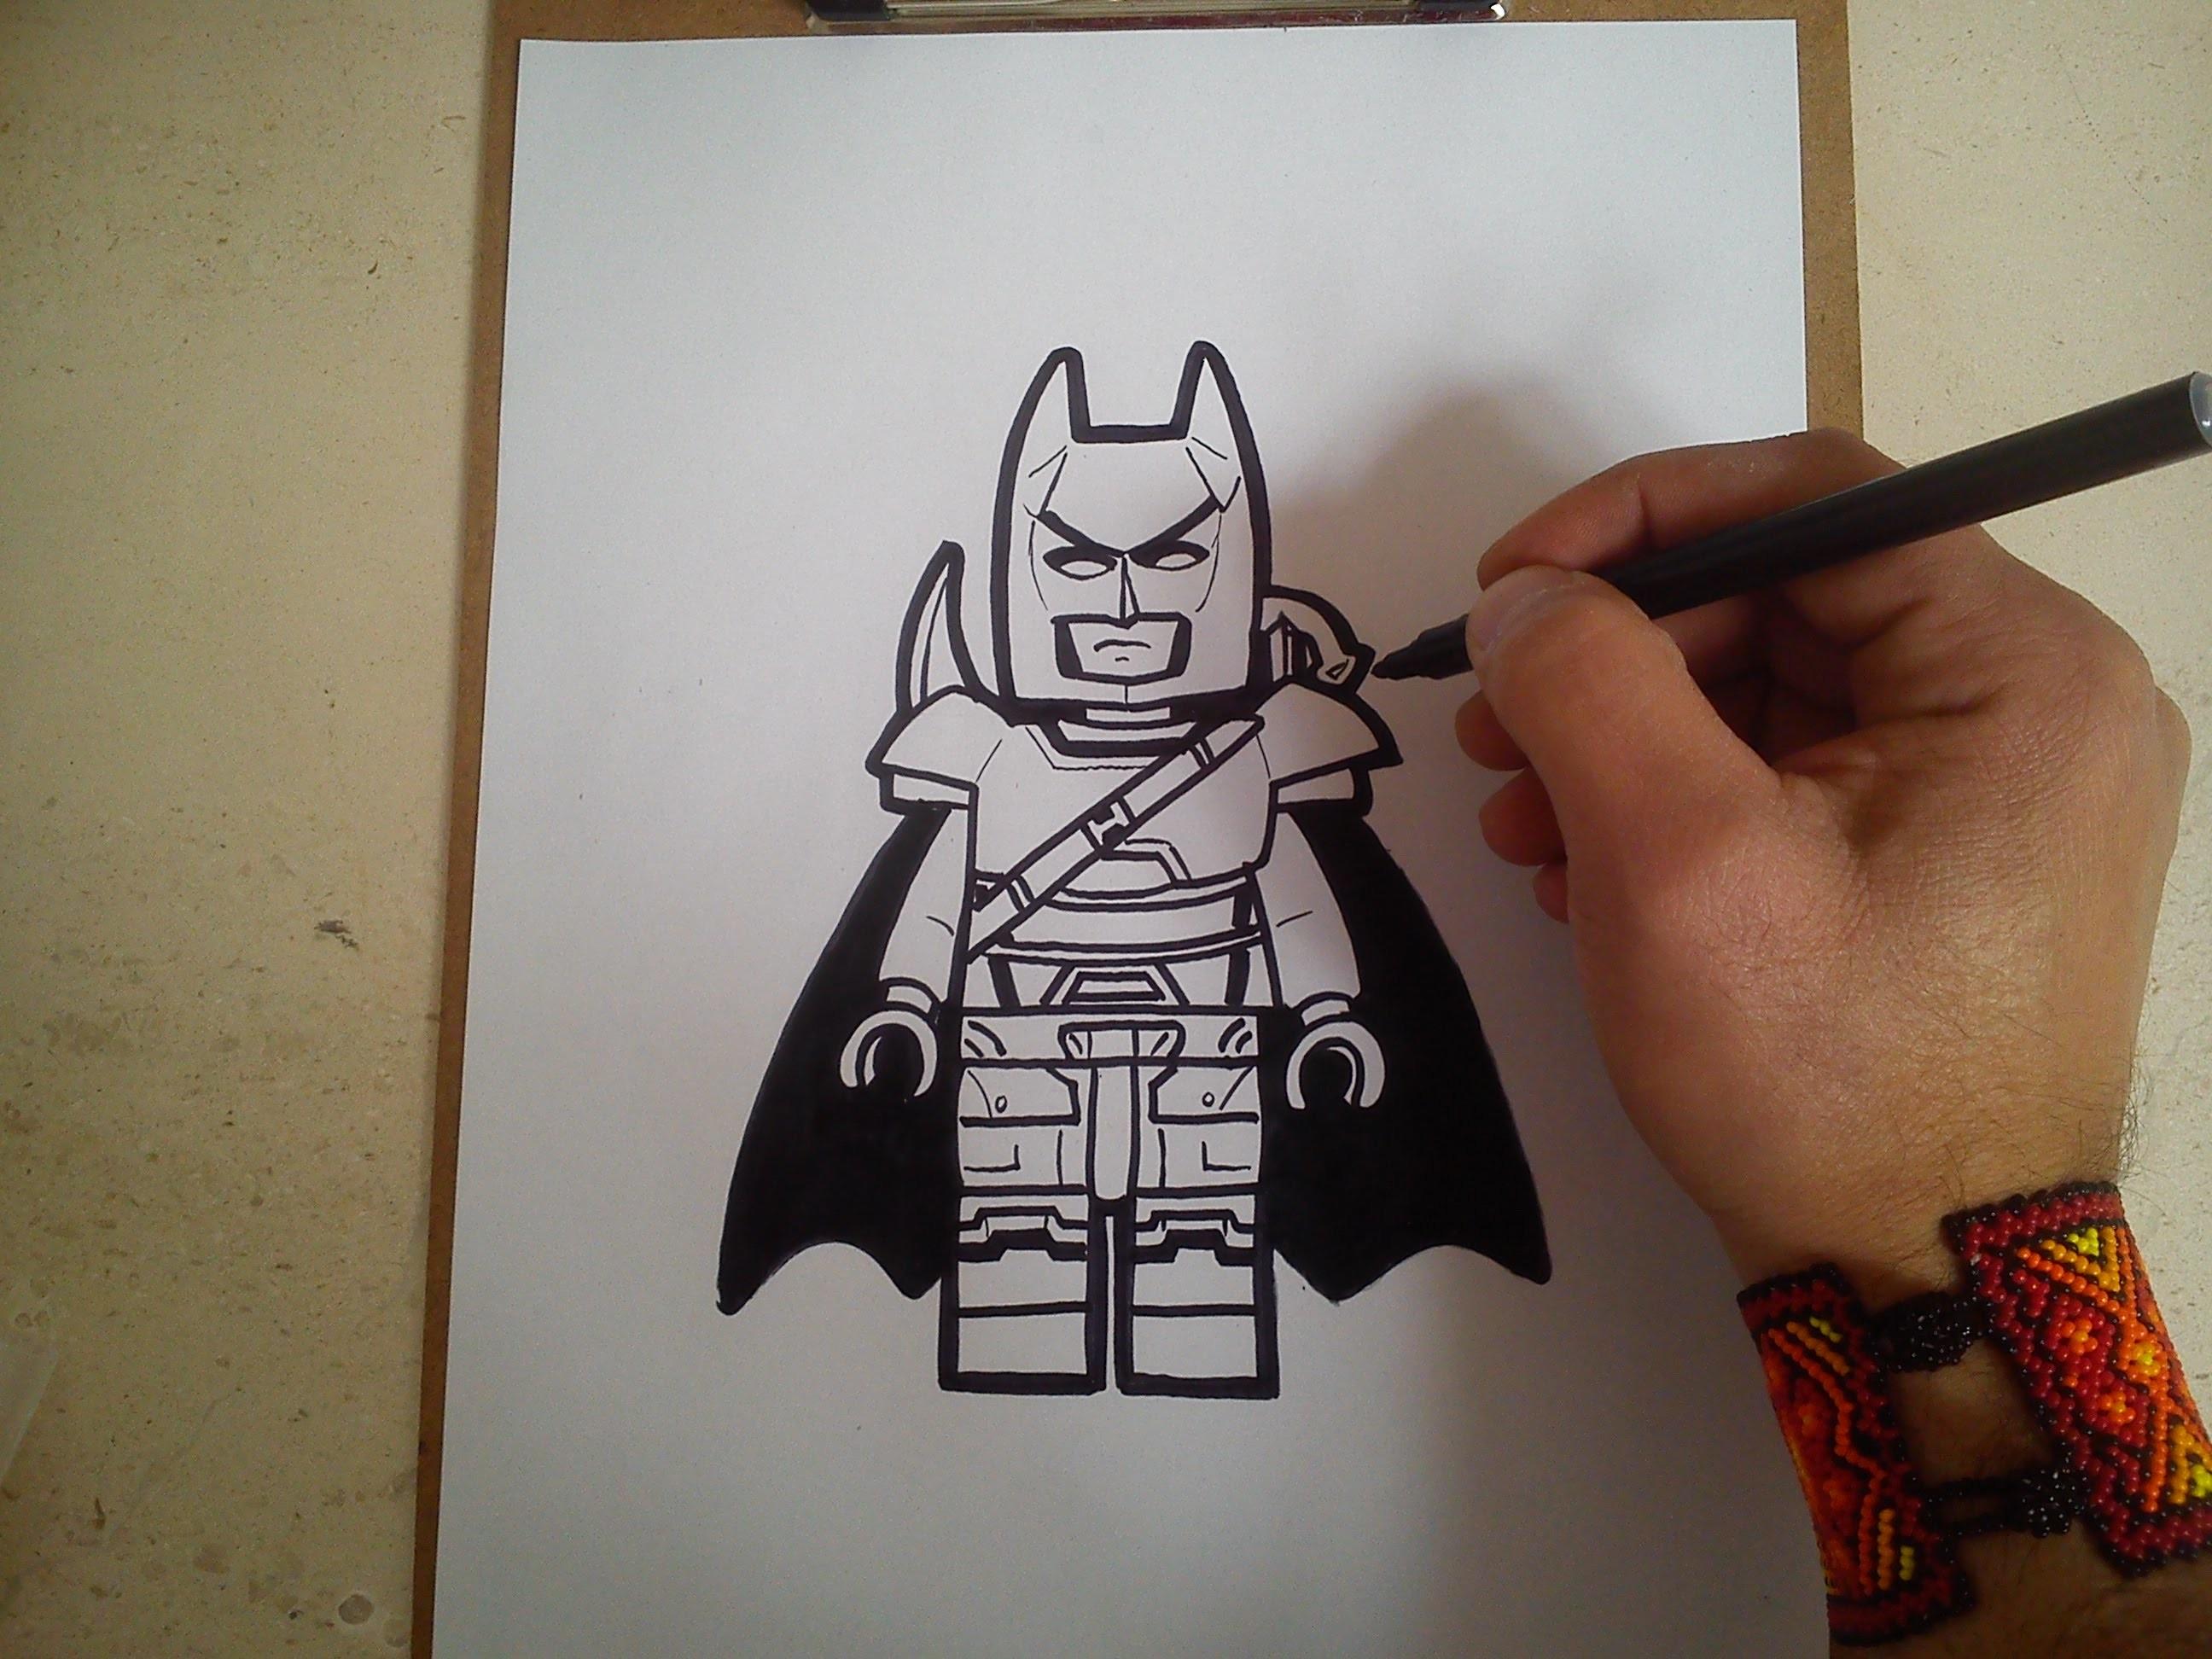 Como Dibujar A Batman Armadura Lego. How To Draw Batman Vs